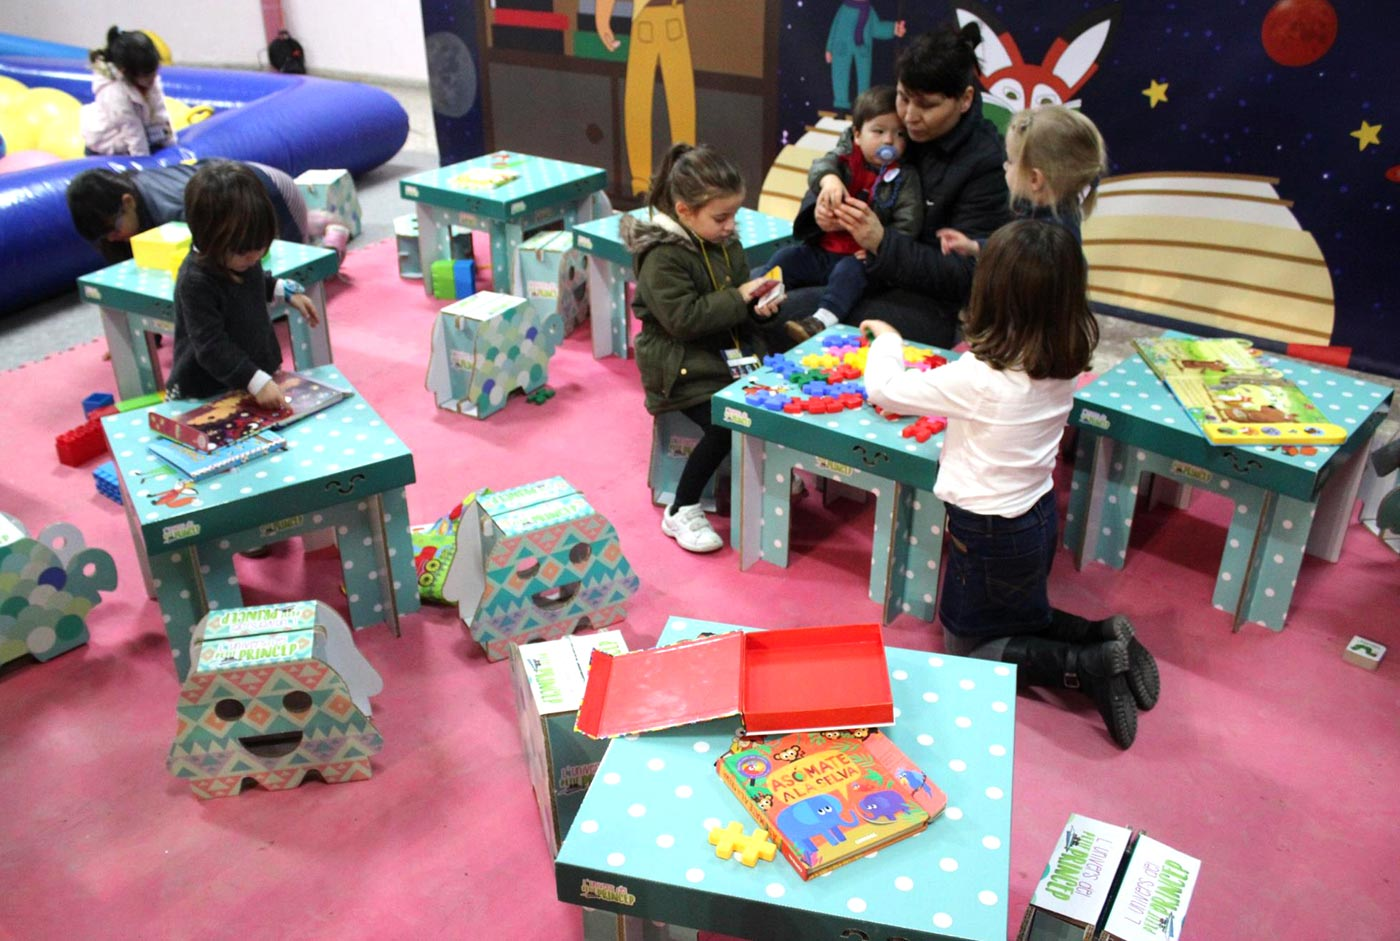 Dise o de ludotecas infantiles decoraci n mobiliario y for Muebles infantiles de diseno